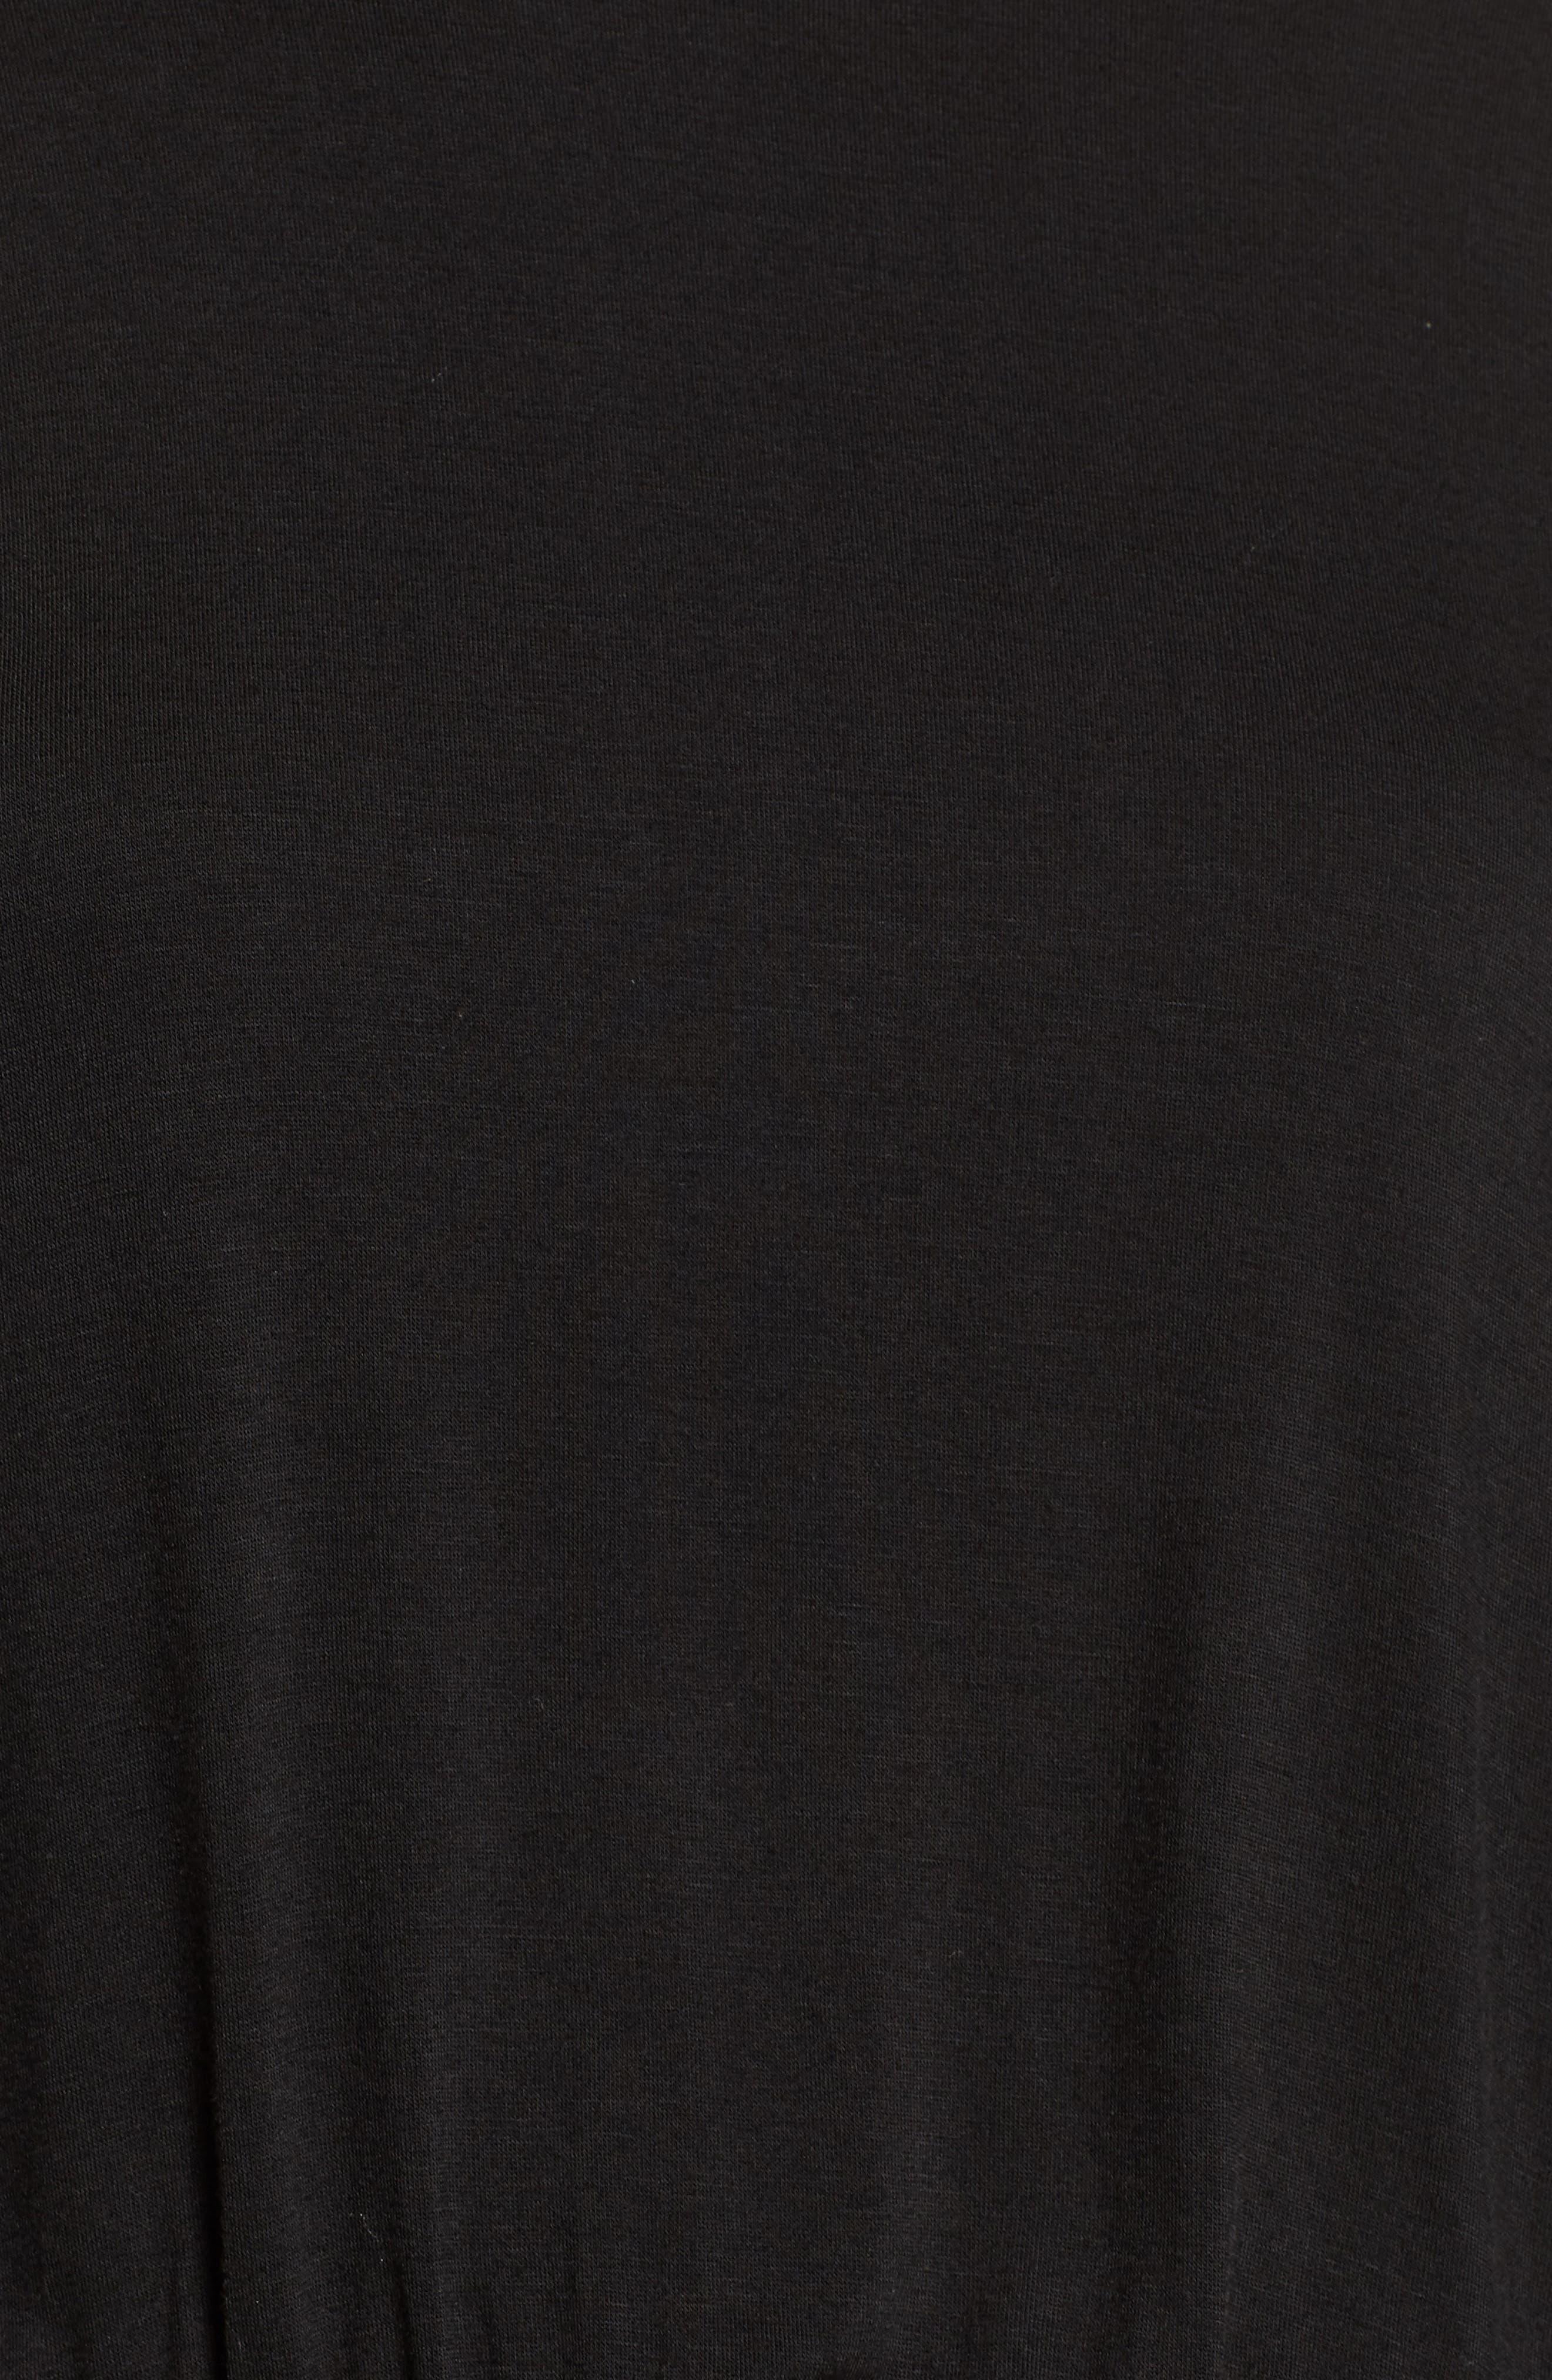 Short Sleeve Ruched Dress,                             Alternate thumbnail 6, color,                             Black